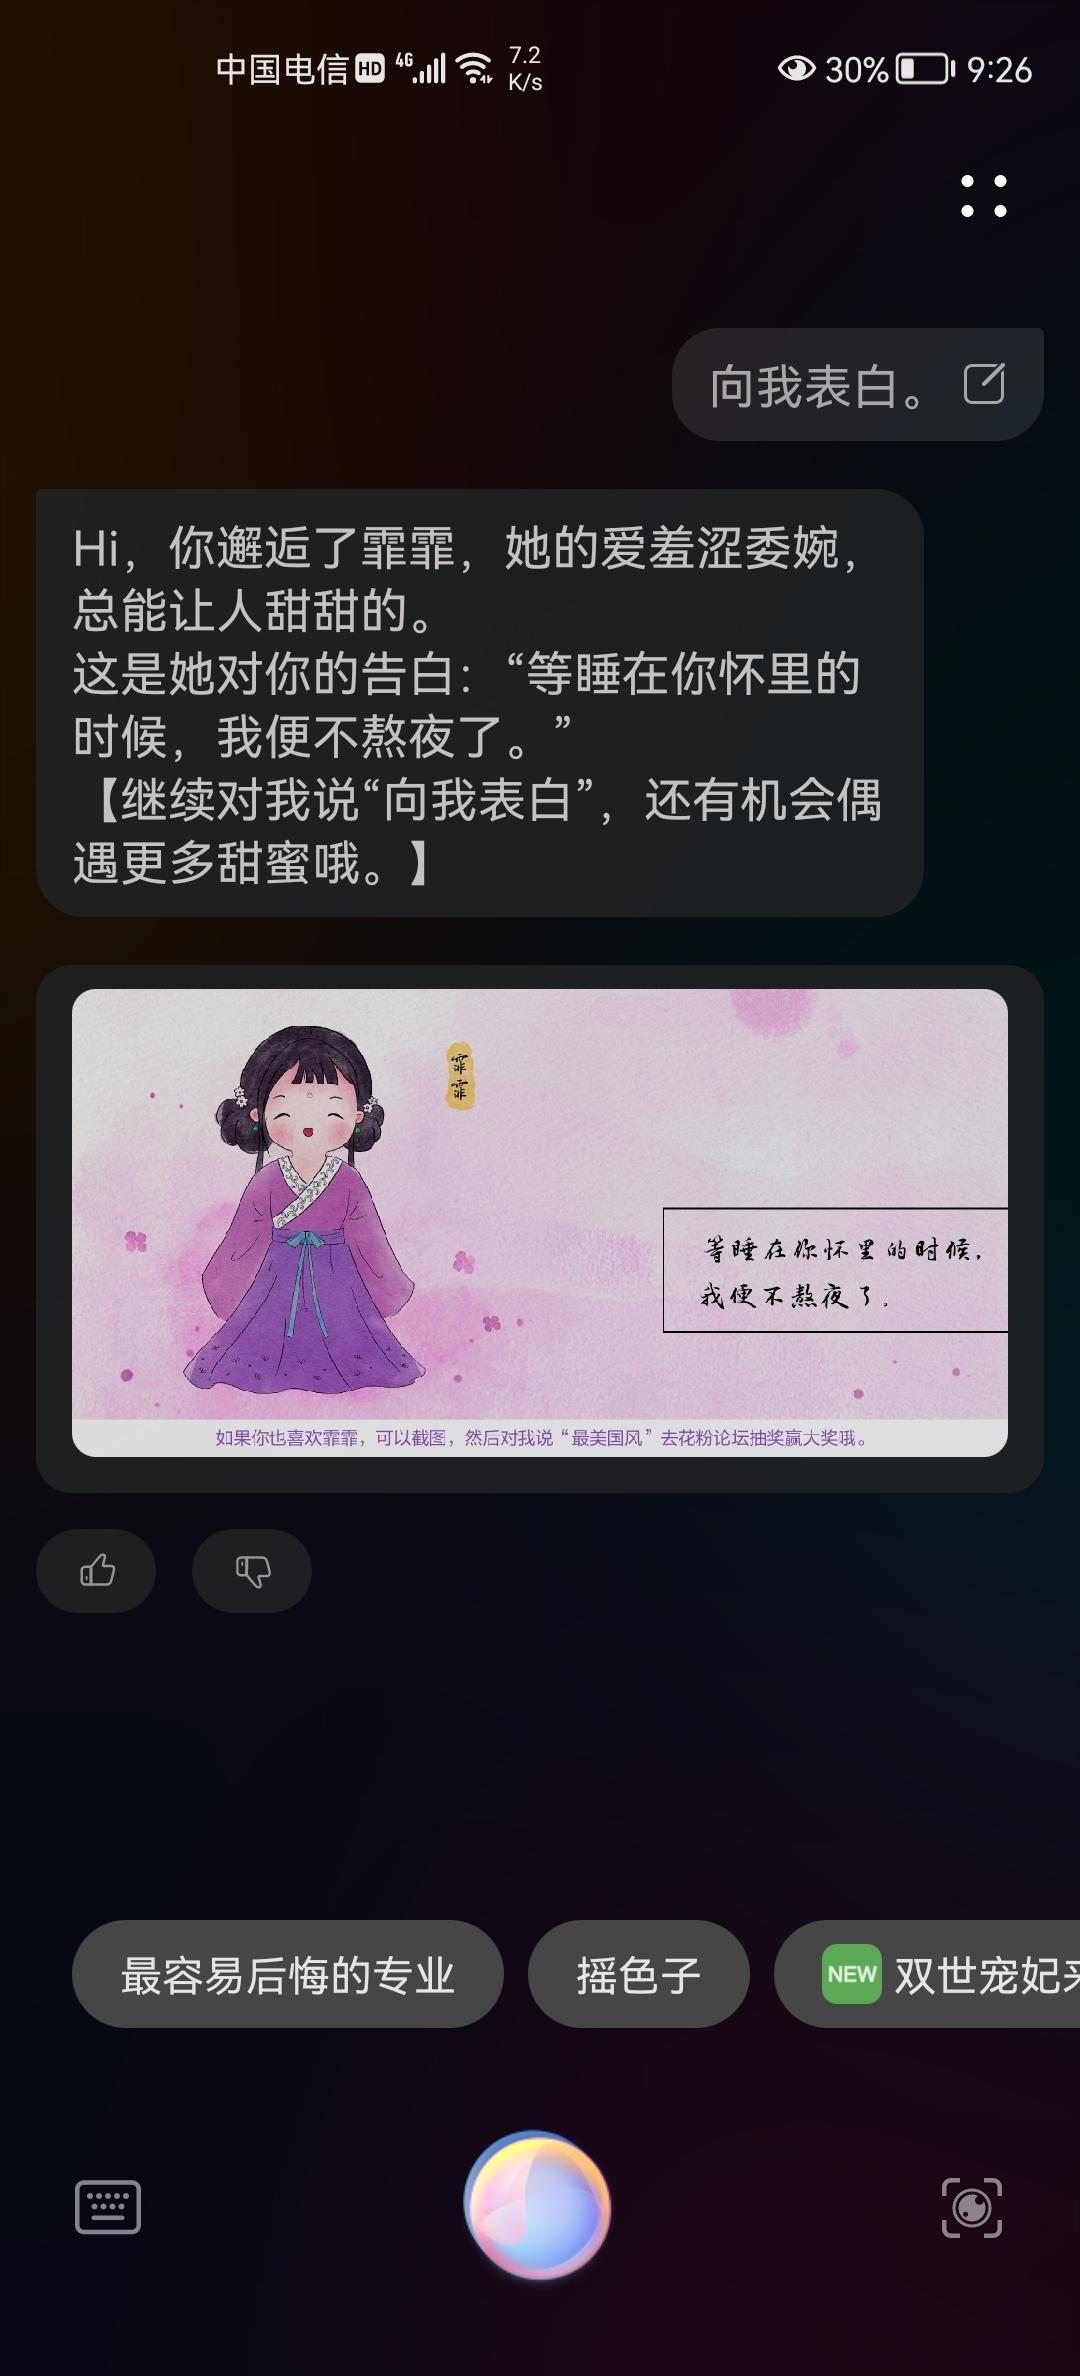 Screenshot_20210611_212634_com.huawei.vassistant.jpg